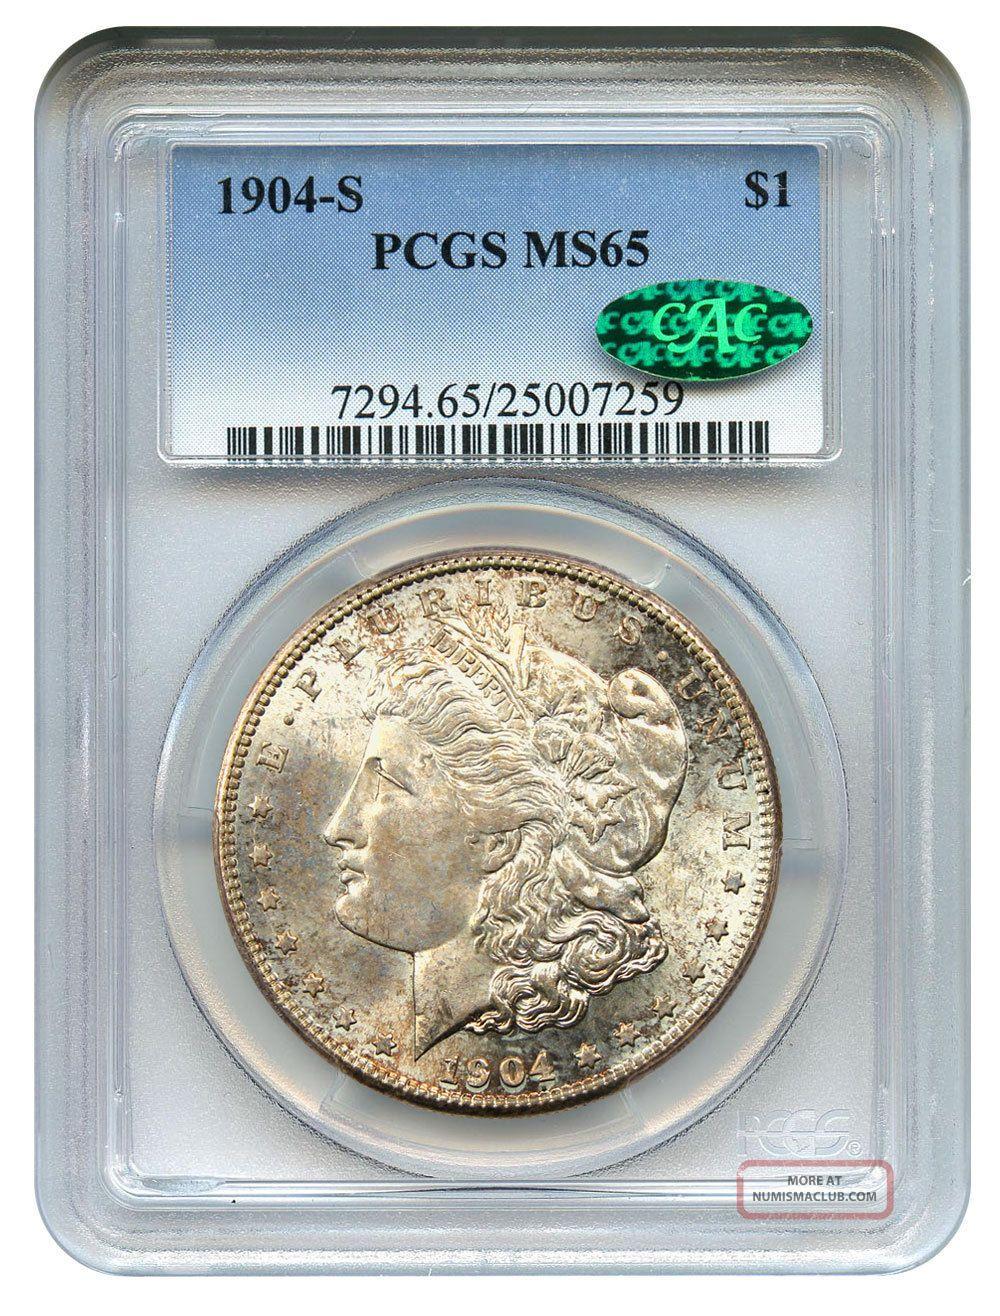 1904 - S $1 Pcgs/cac Ms65 - Key Date S - - Morgan Silver Dollar Dollars photo